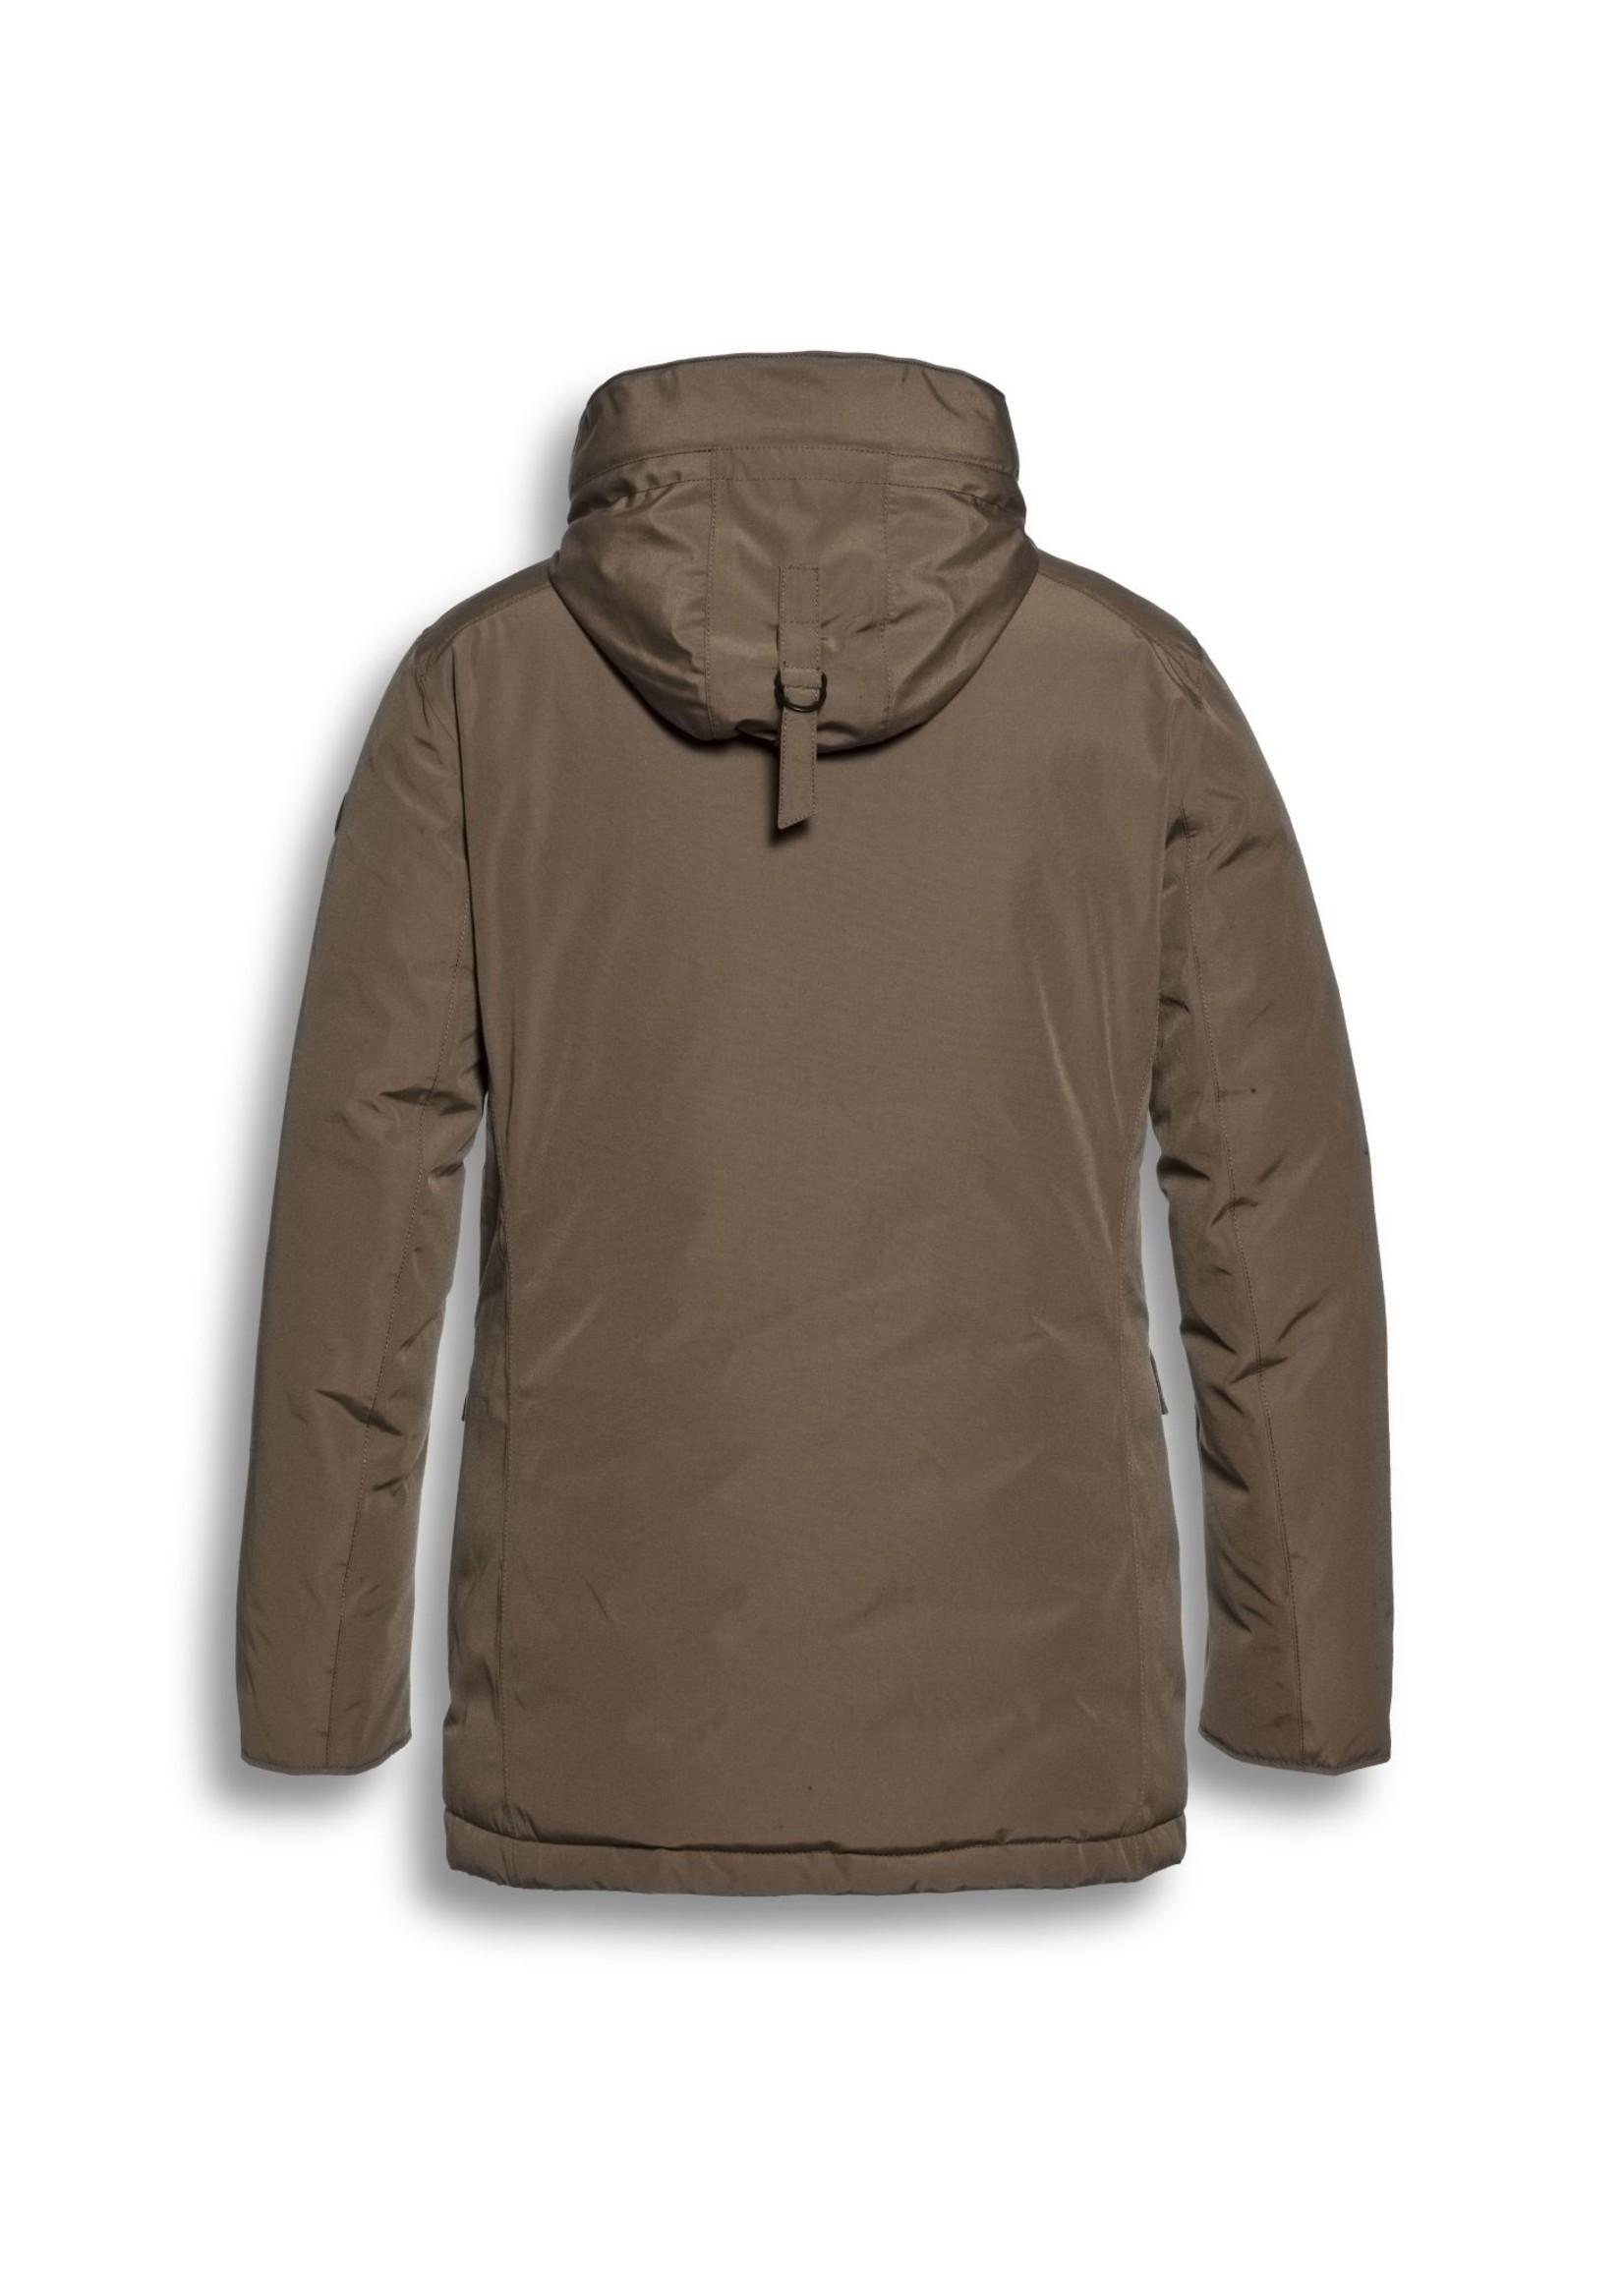 Reset jack Moore khaki